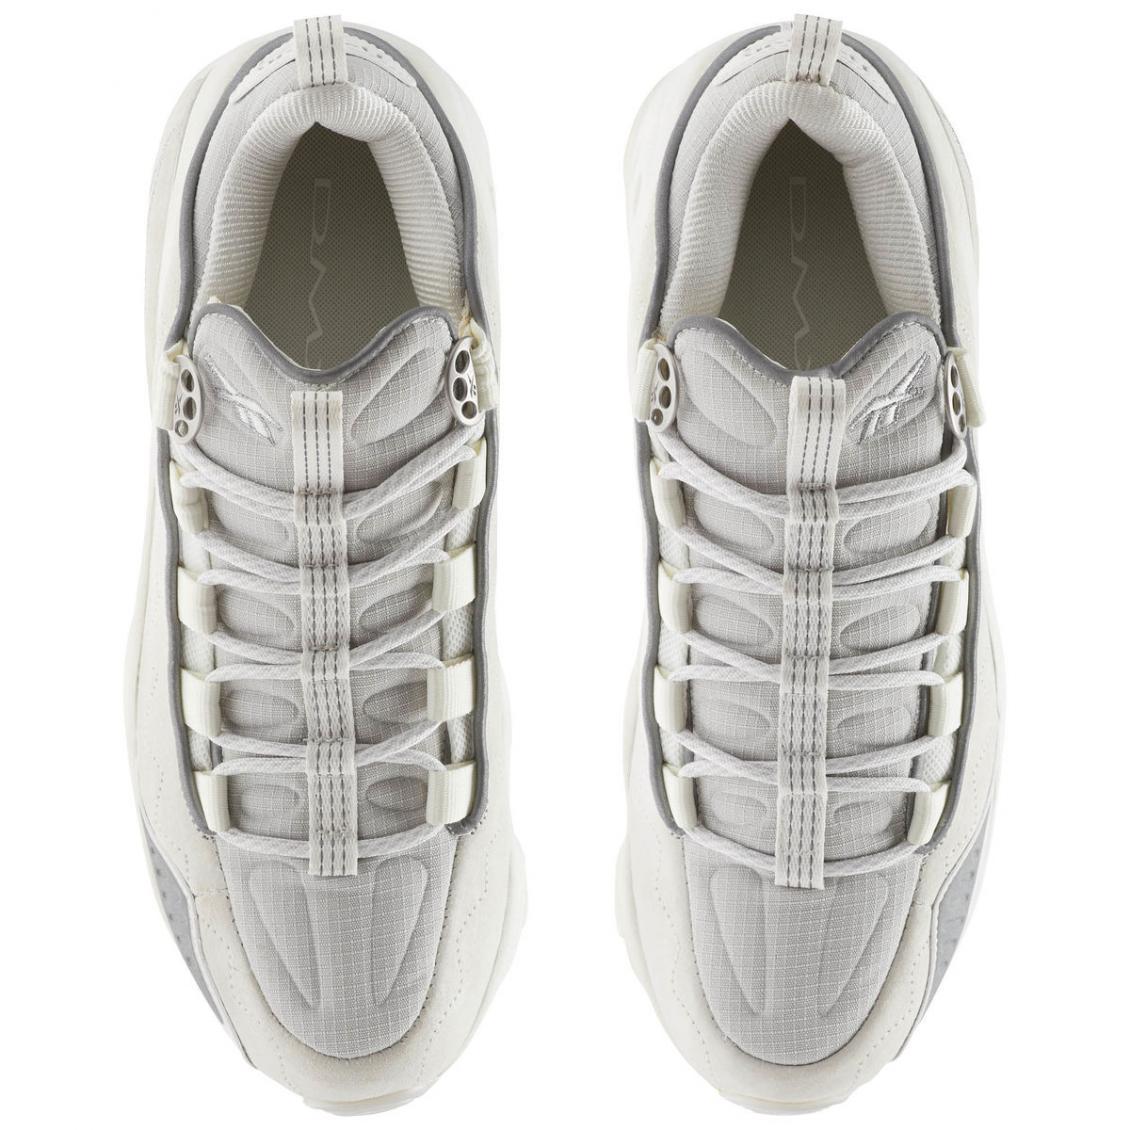 White – Reebok DMX Run 10 SE Mens Chalk / White / Ice